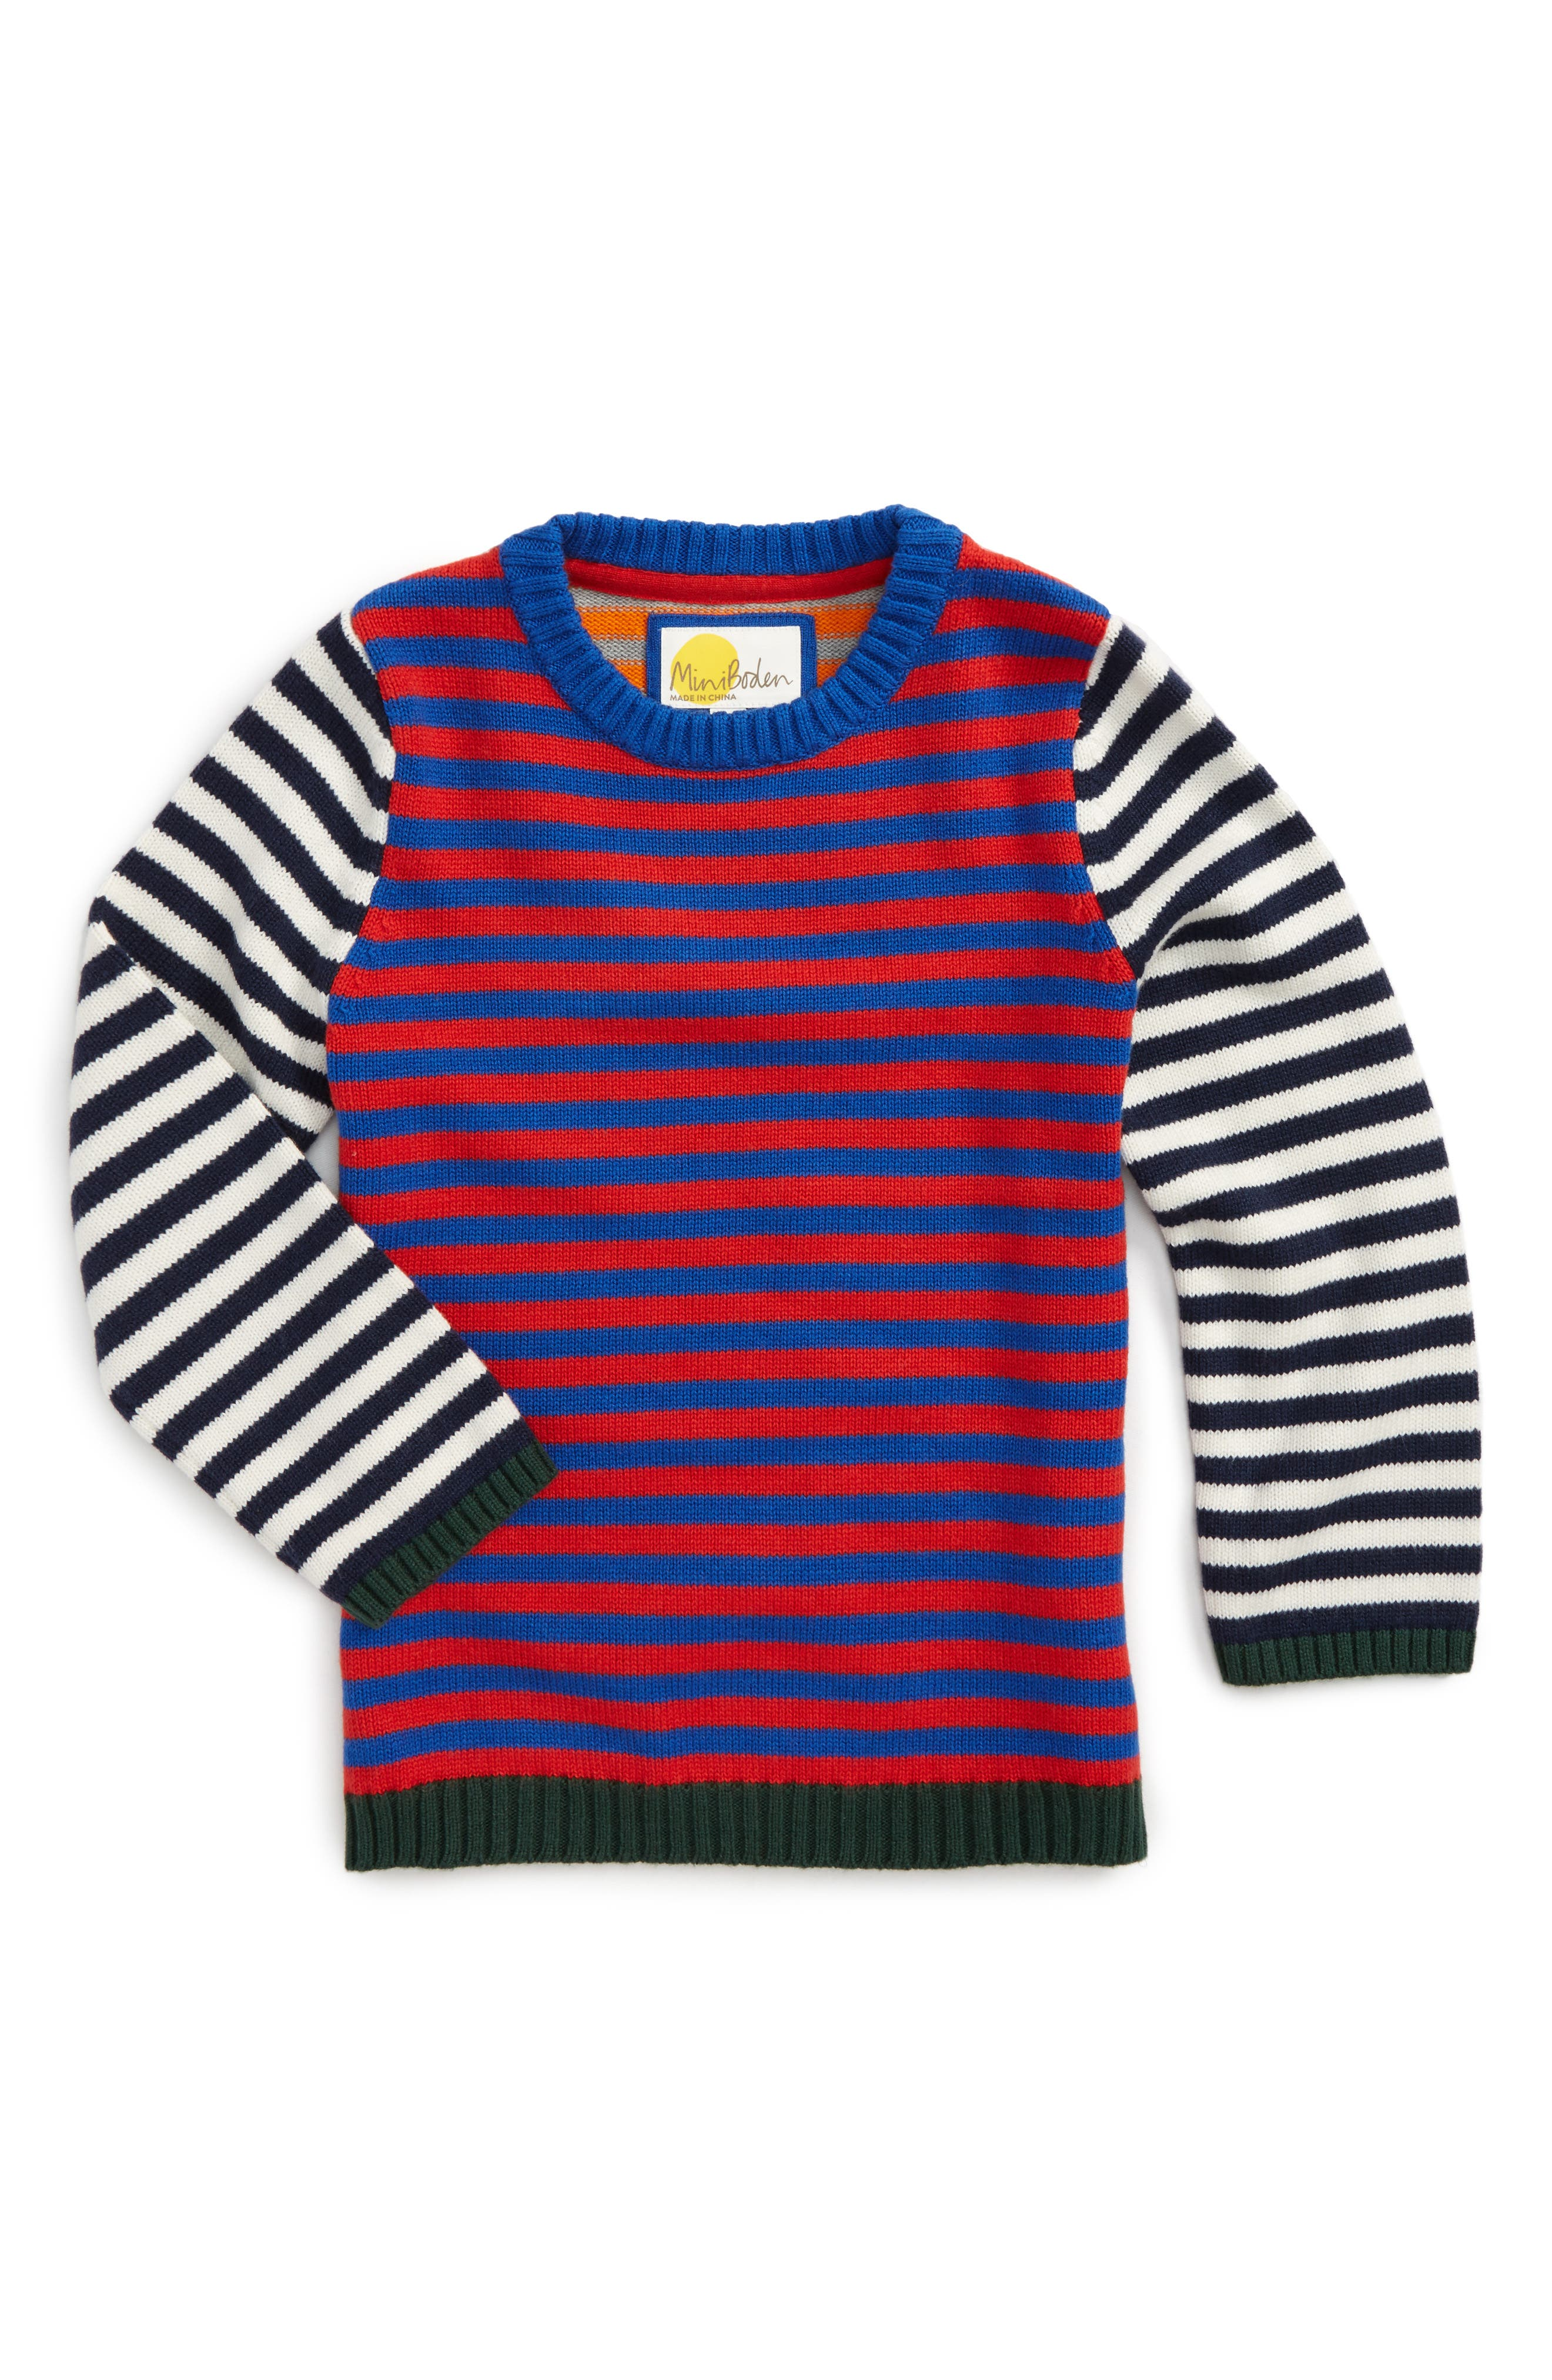 Main Image - Mini Boden Hotchpotch Sweater (Toddler Boys, Little Boys & Big Boys)